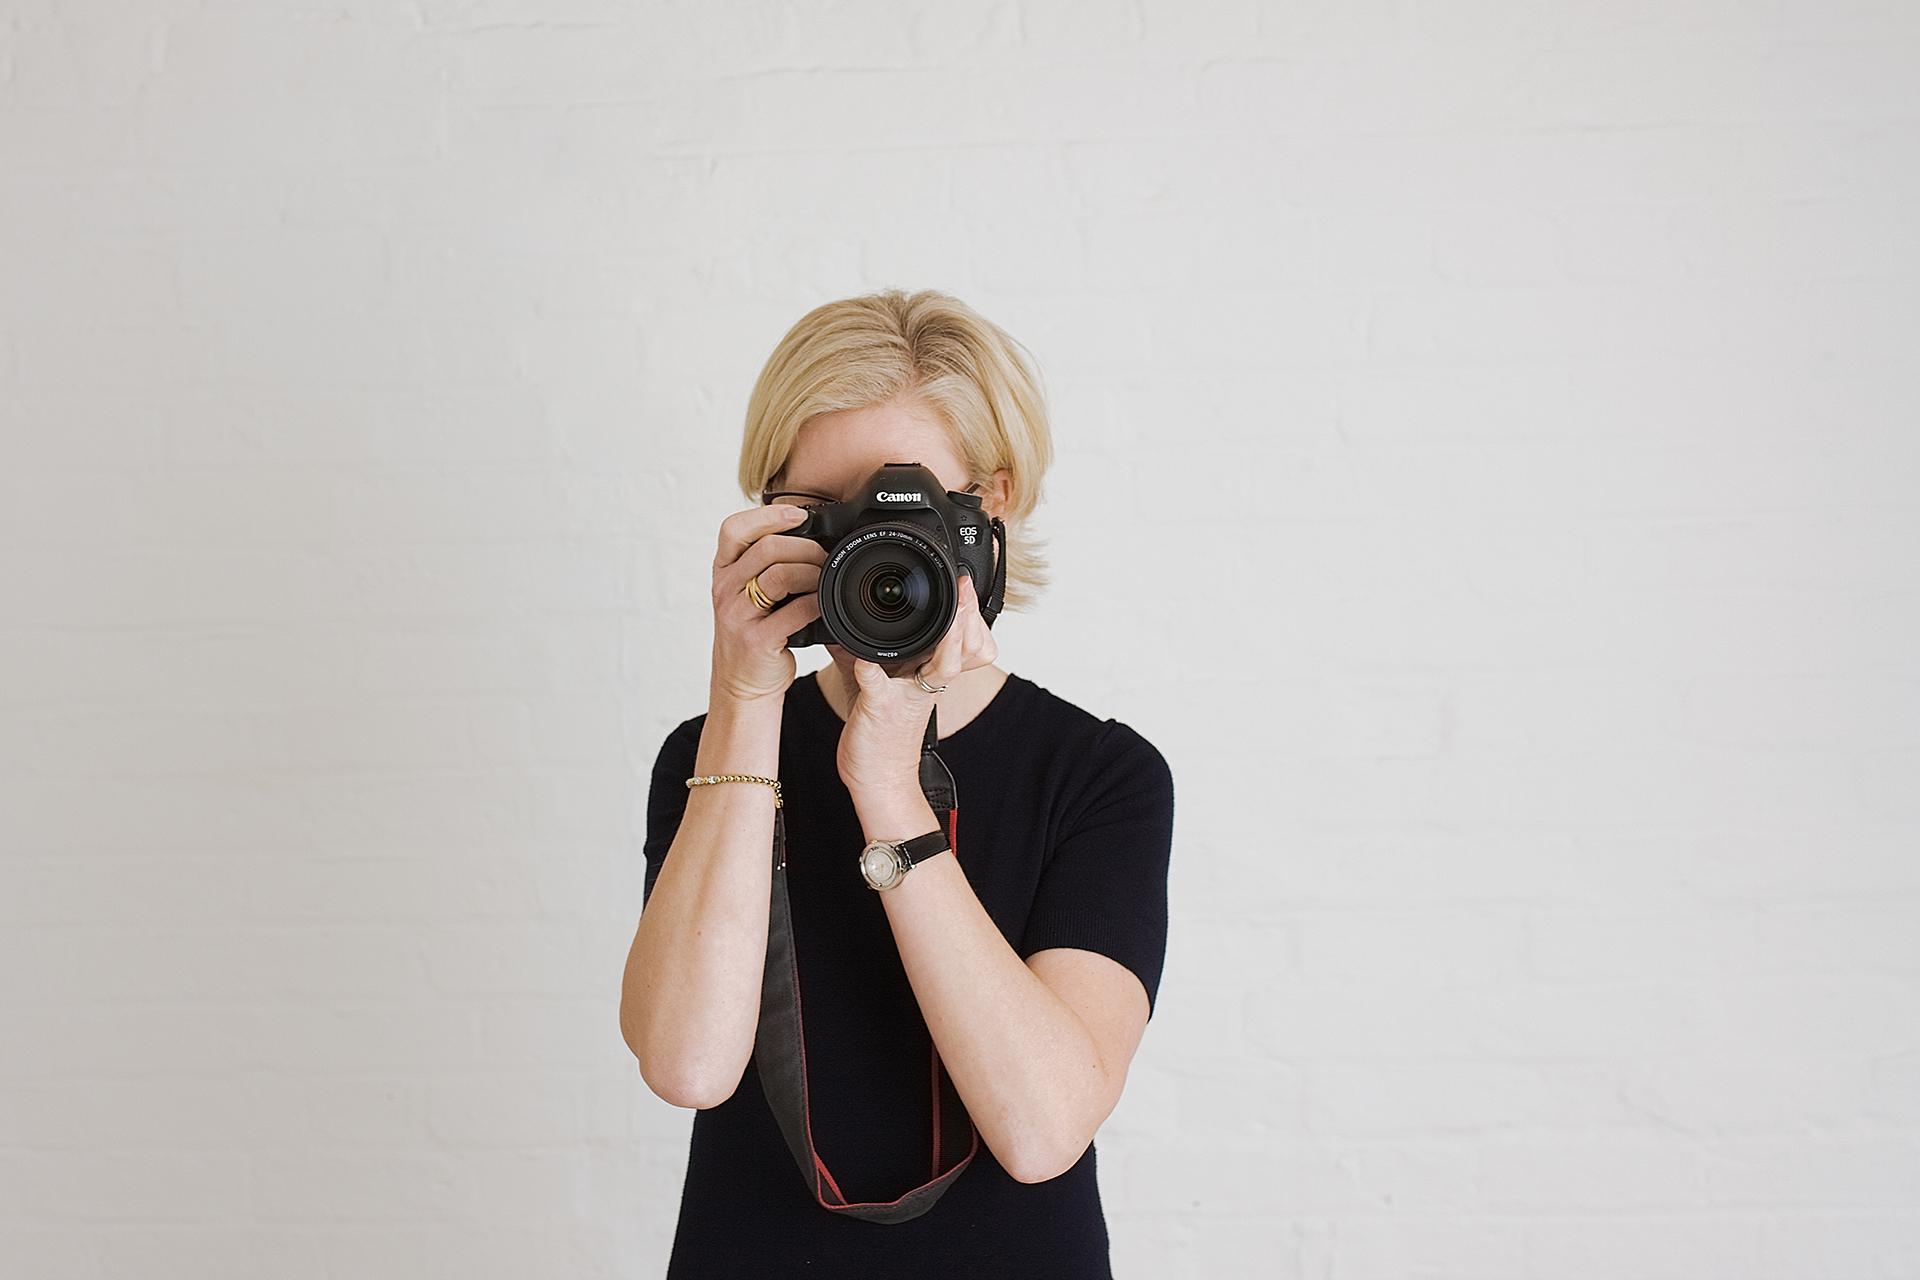 Mindset shift for being on camera